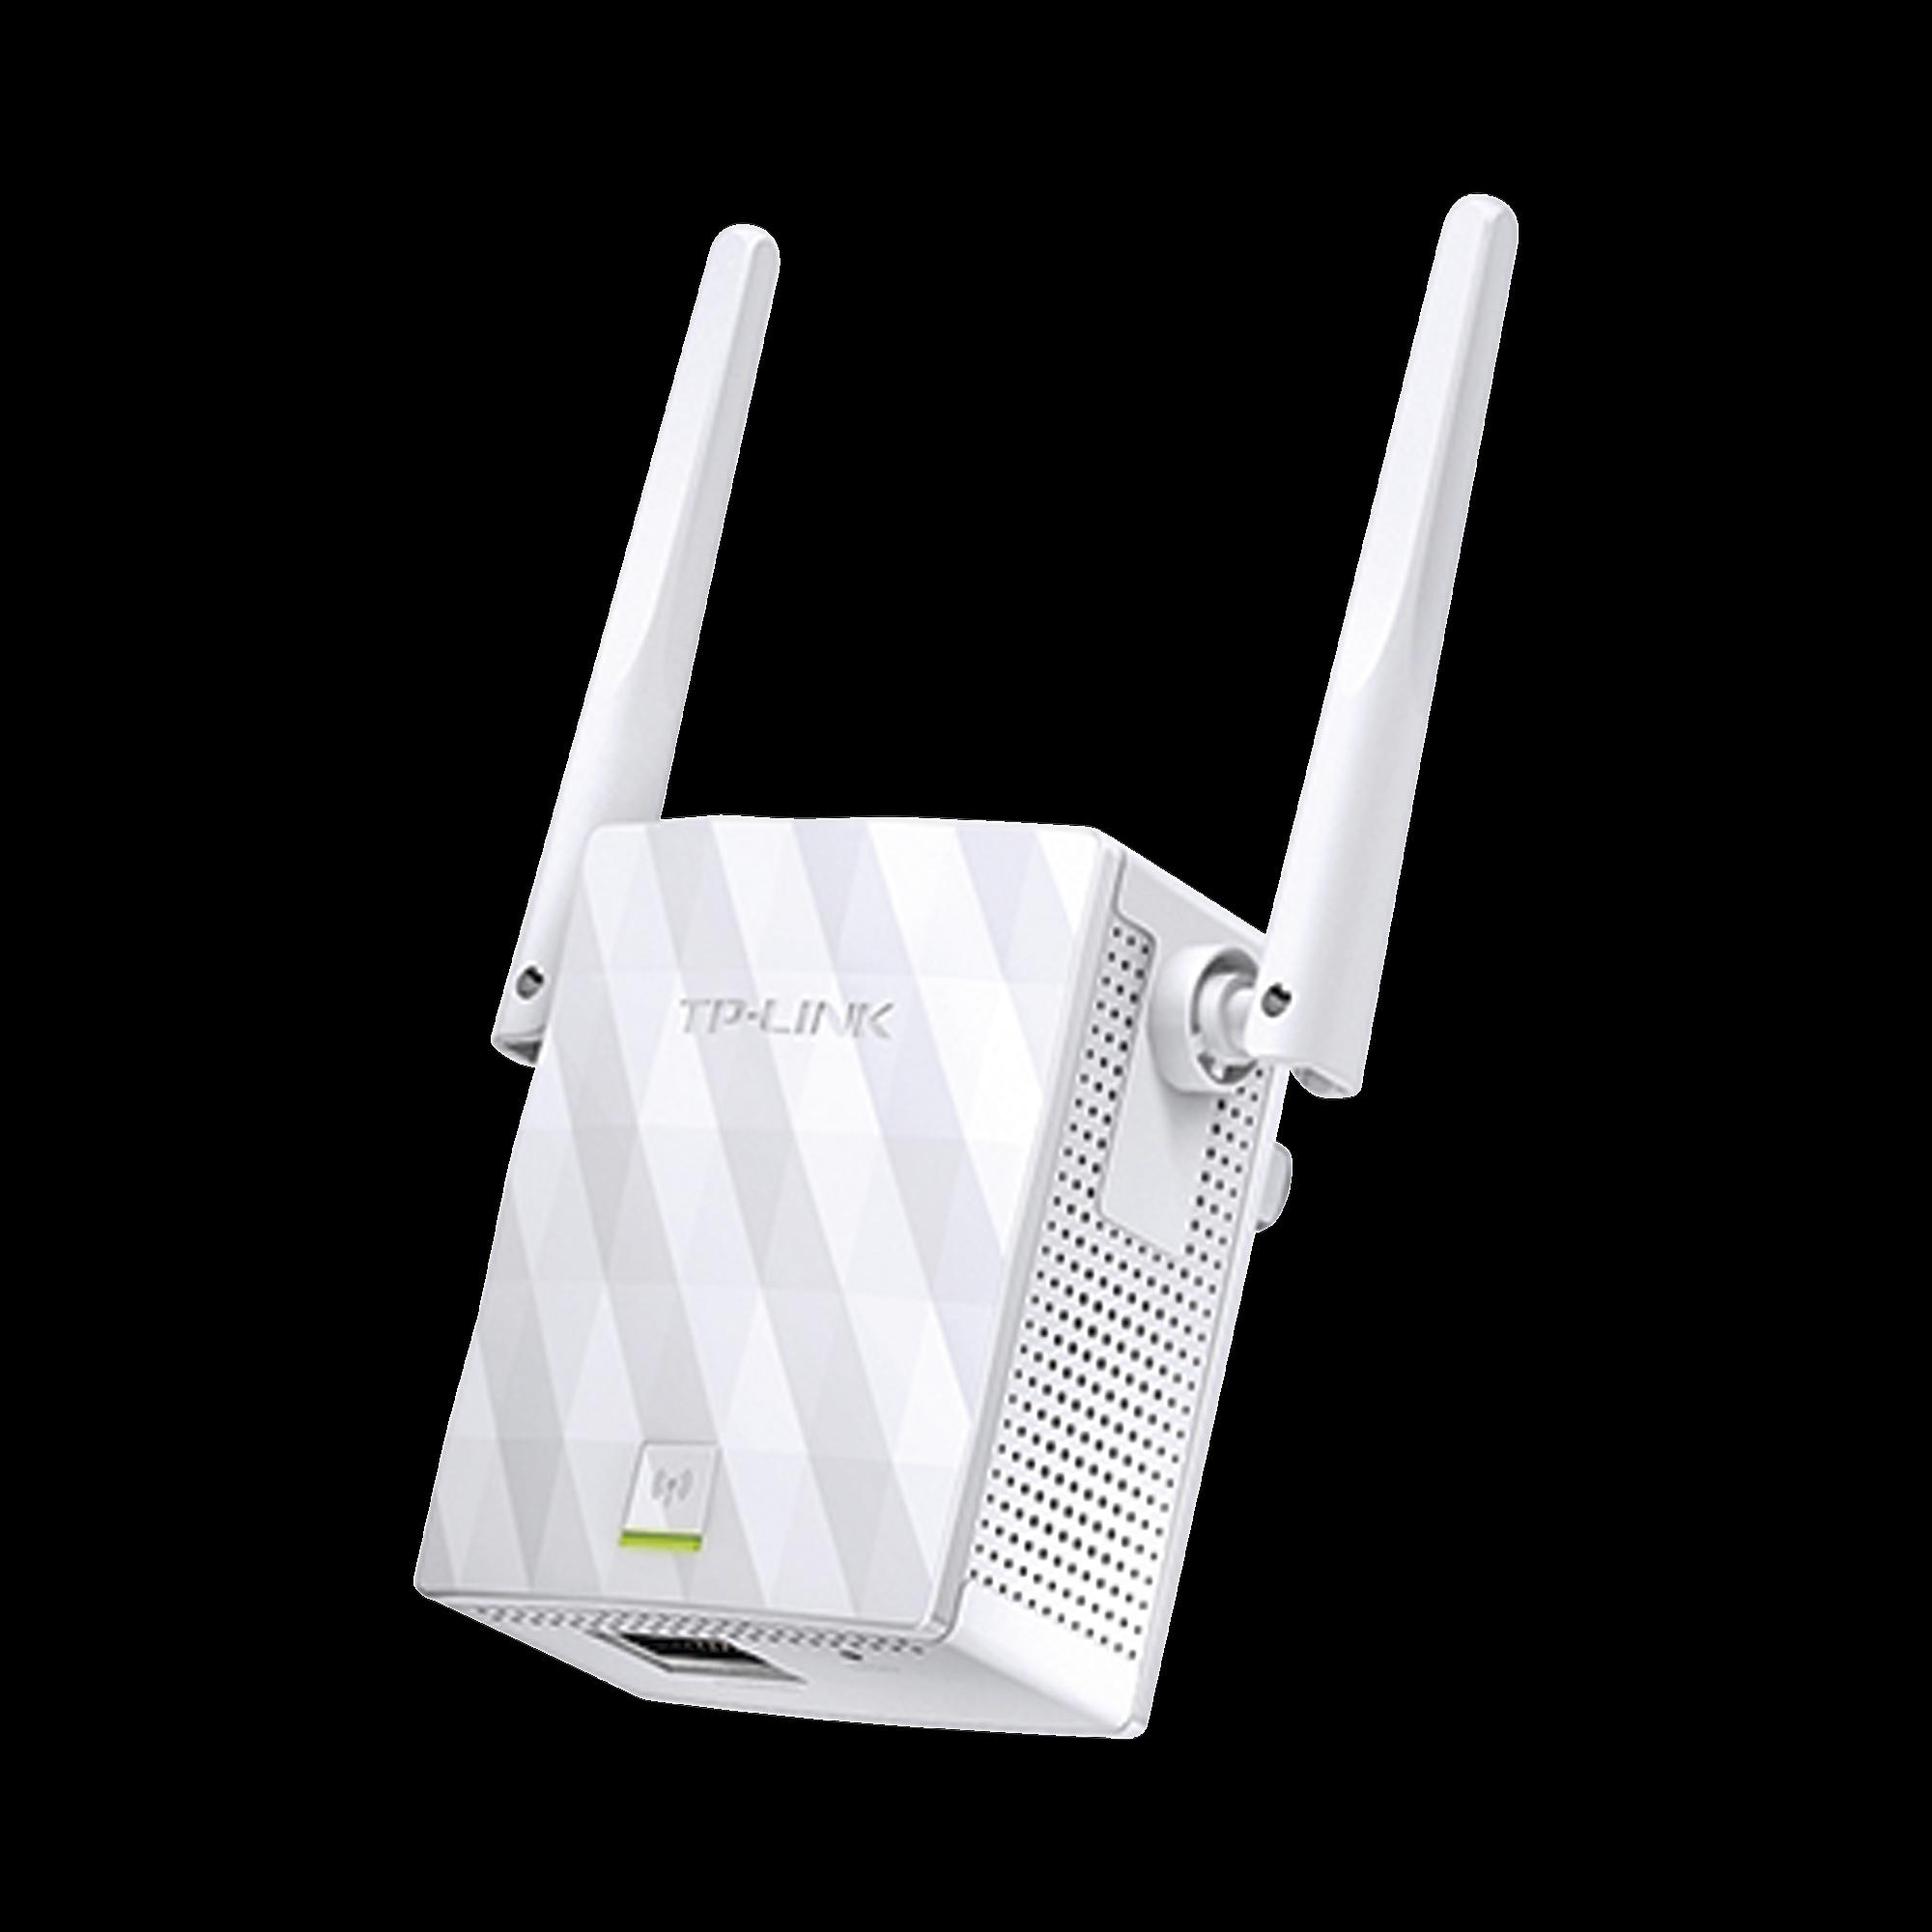 Repetidor / Extensor de Cobertura WiFi N, 300 Mbps, 2.4 GHz , con 1 puerto 10/100 Mbps y 2 antenas externas